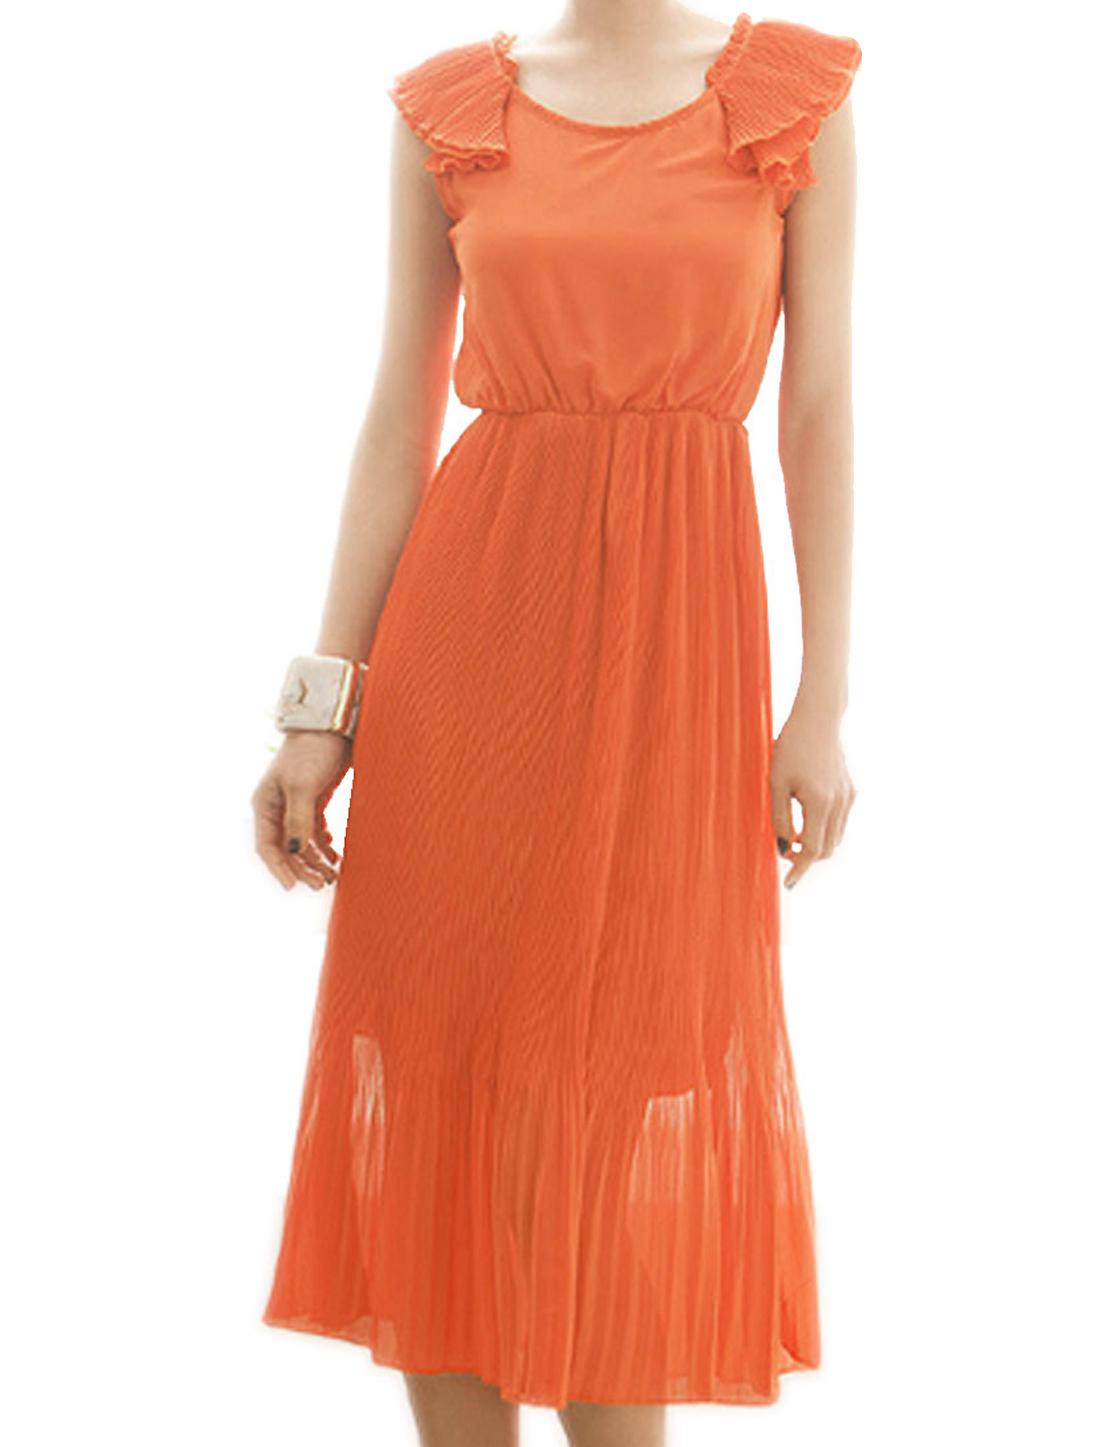 Woman Elastic Waist Flouncing Decor Round Neck Tunic Pleated Dress Orange XS